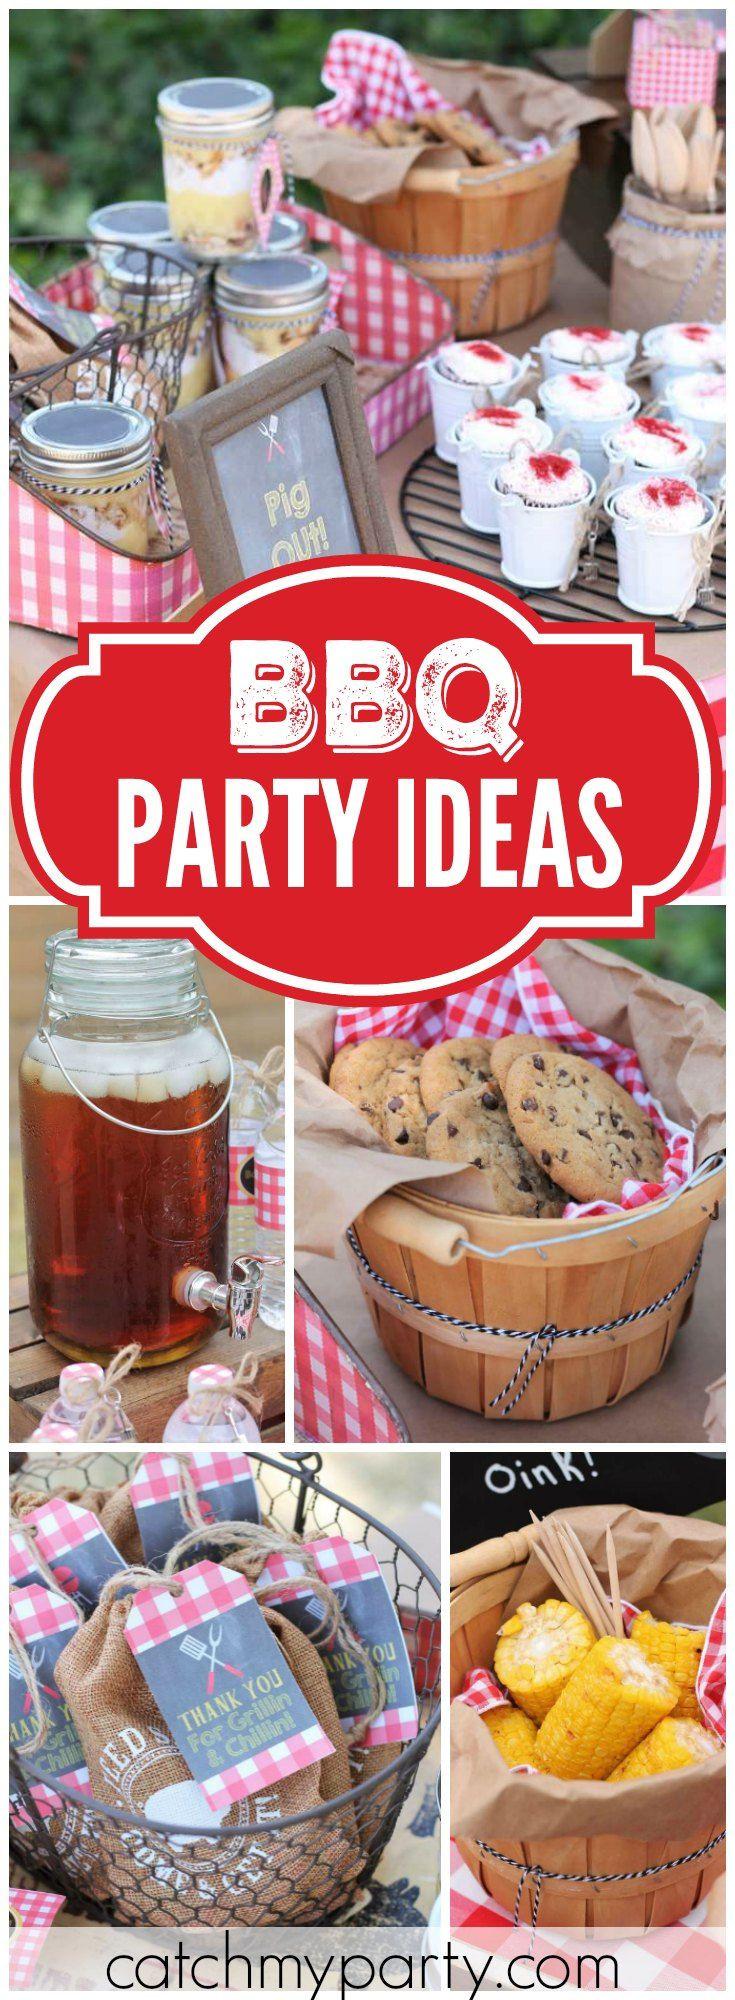 Backyard Bbq Party Ideas  The 25 best Backyard parties ideas on Pinterest